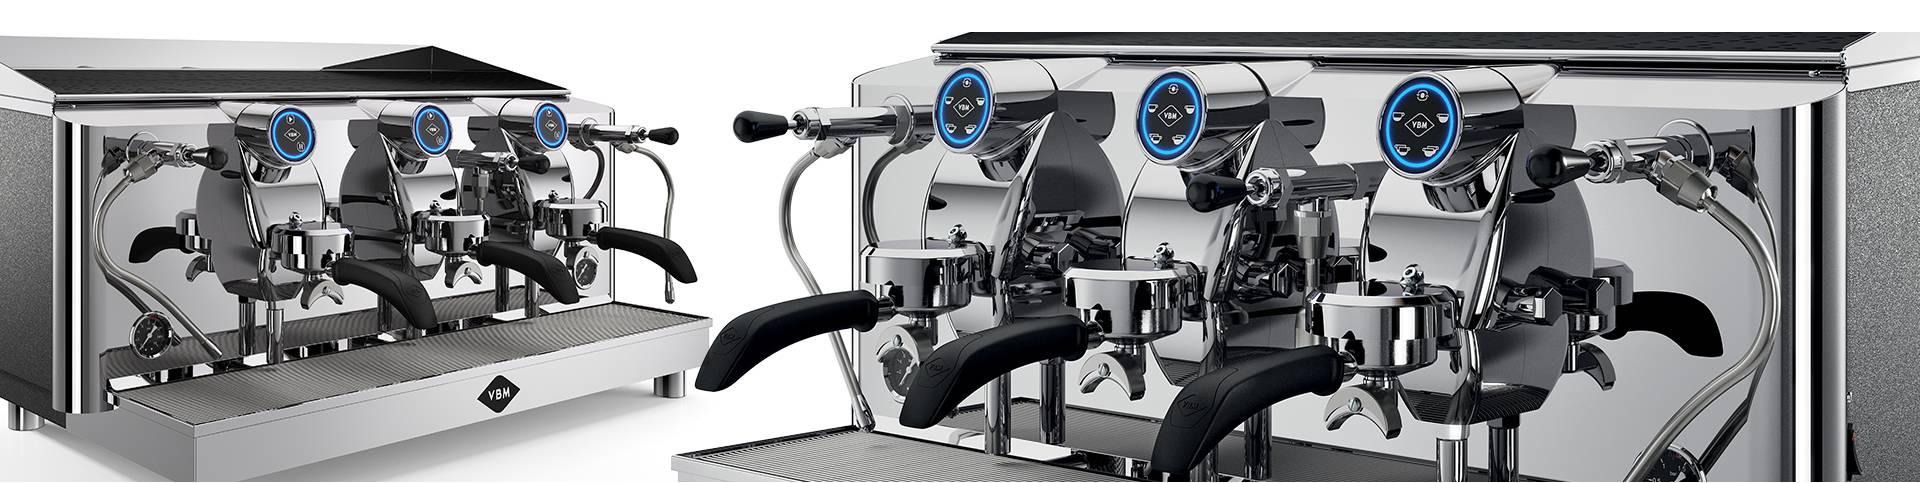 máy pha cafe vbm